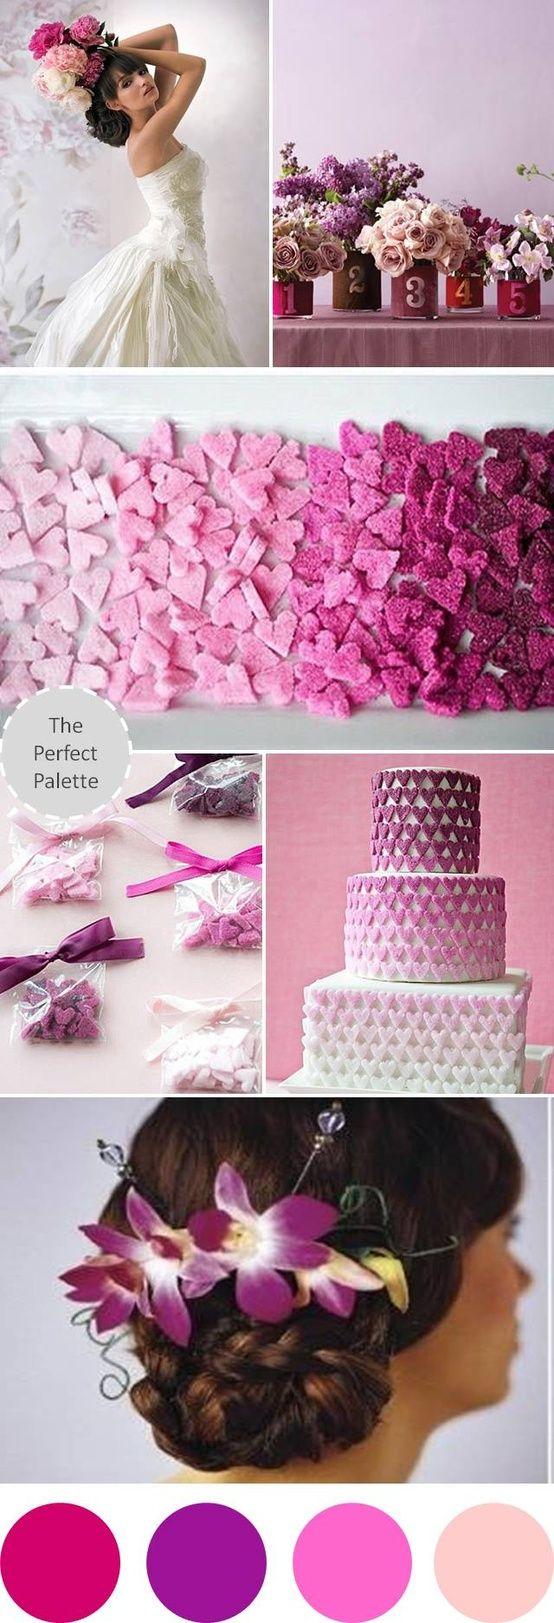 47 best Party images on Pinterest | Wedding stuff, Wedding ...